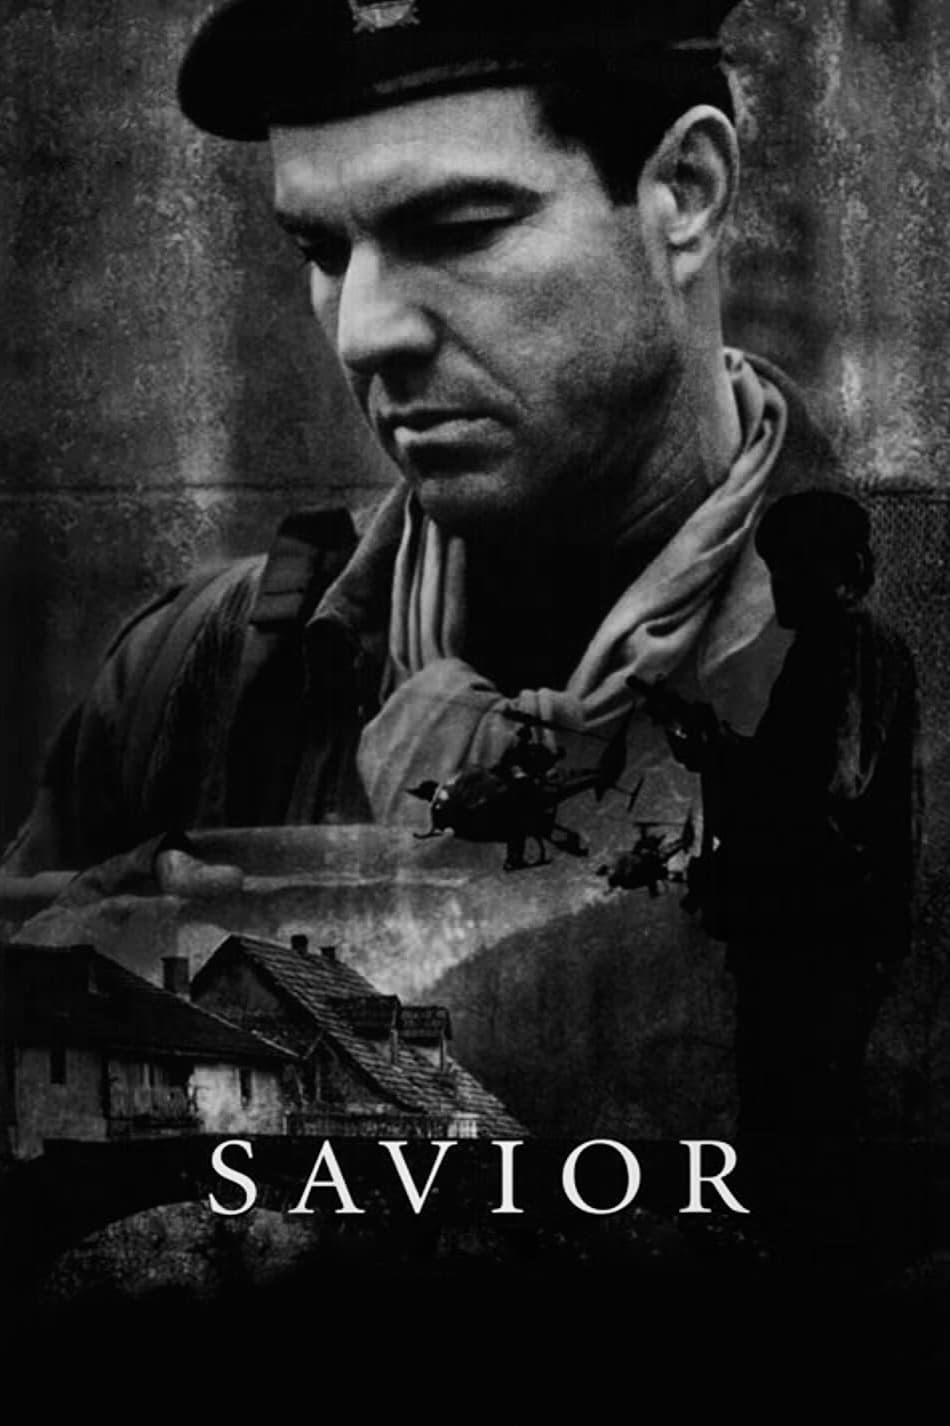 Savior - A Última Guerra